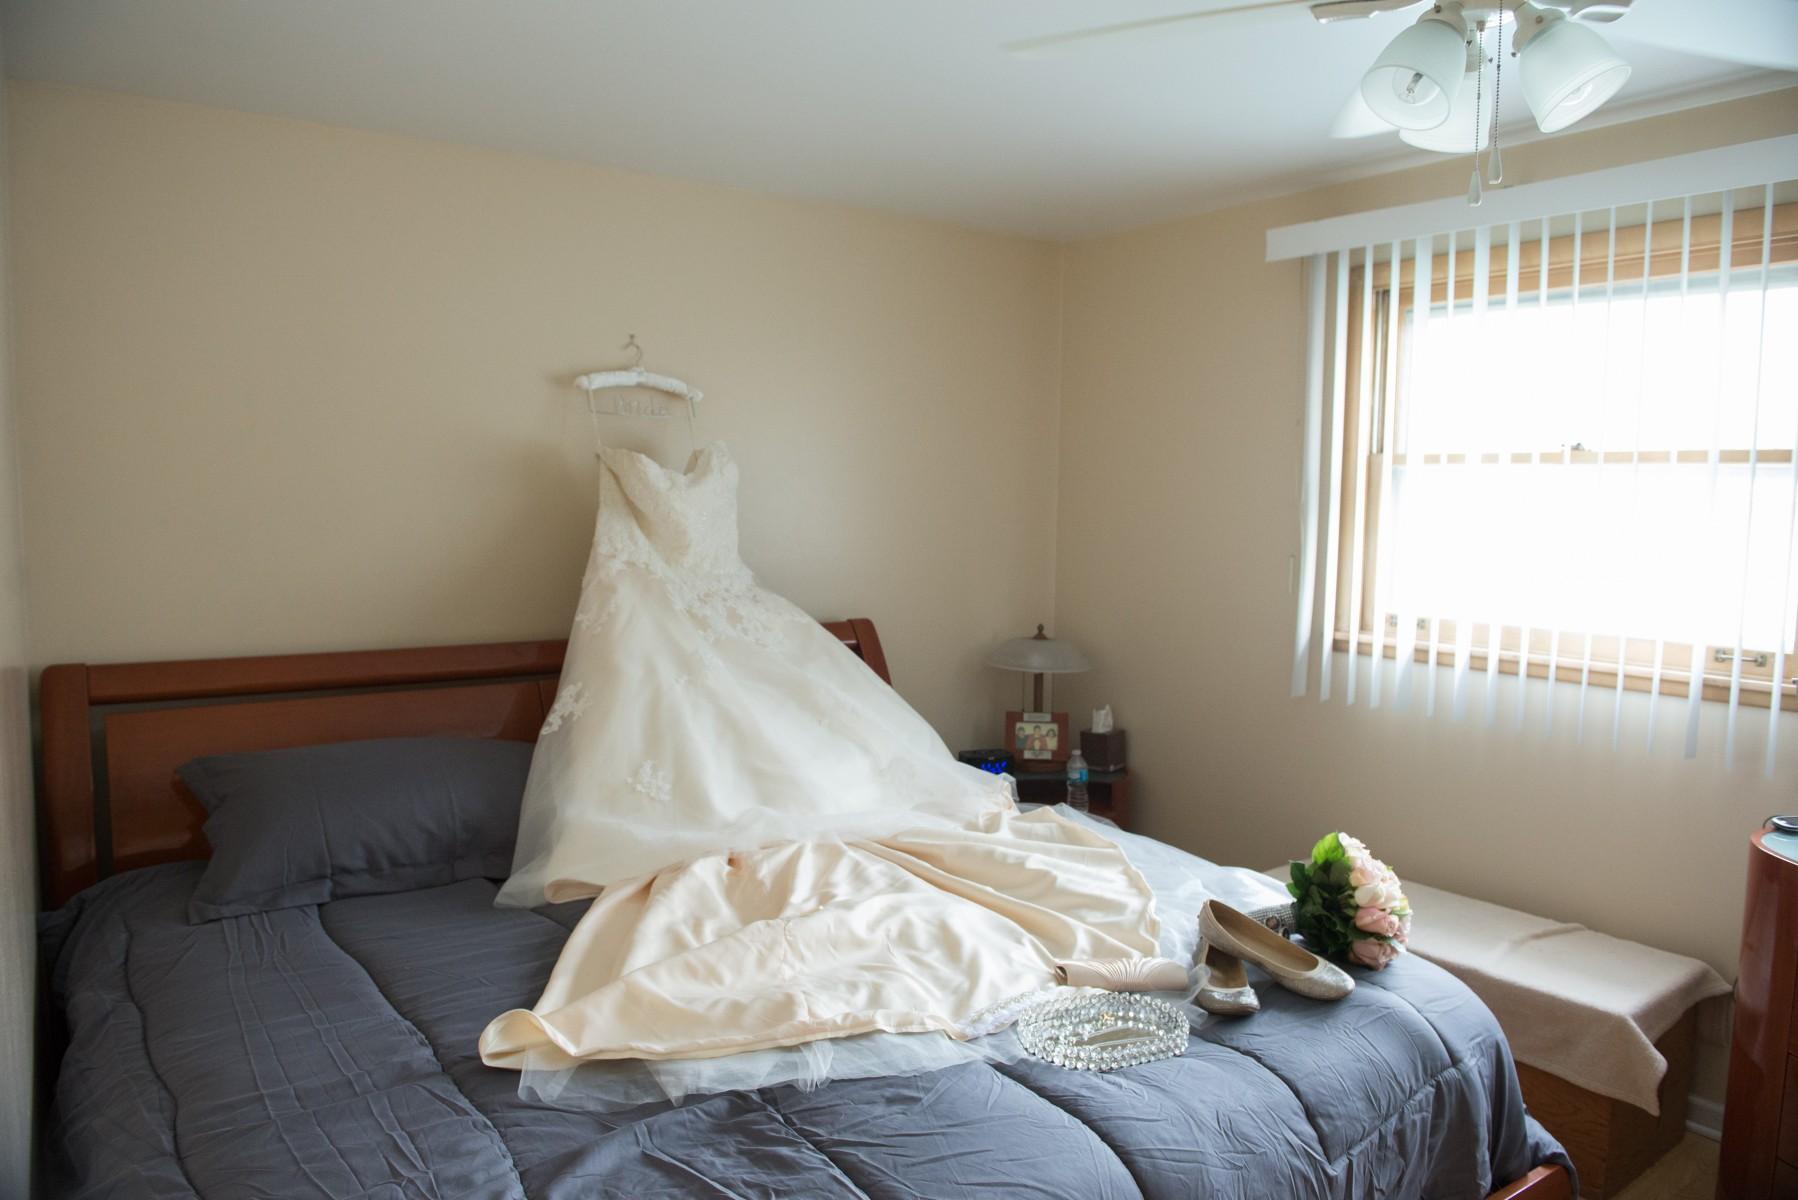 BridesbyYoung-RealBride-PlusSizeCurvyWeddingDress-MargieMichael-2.jpg